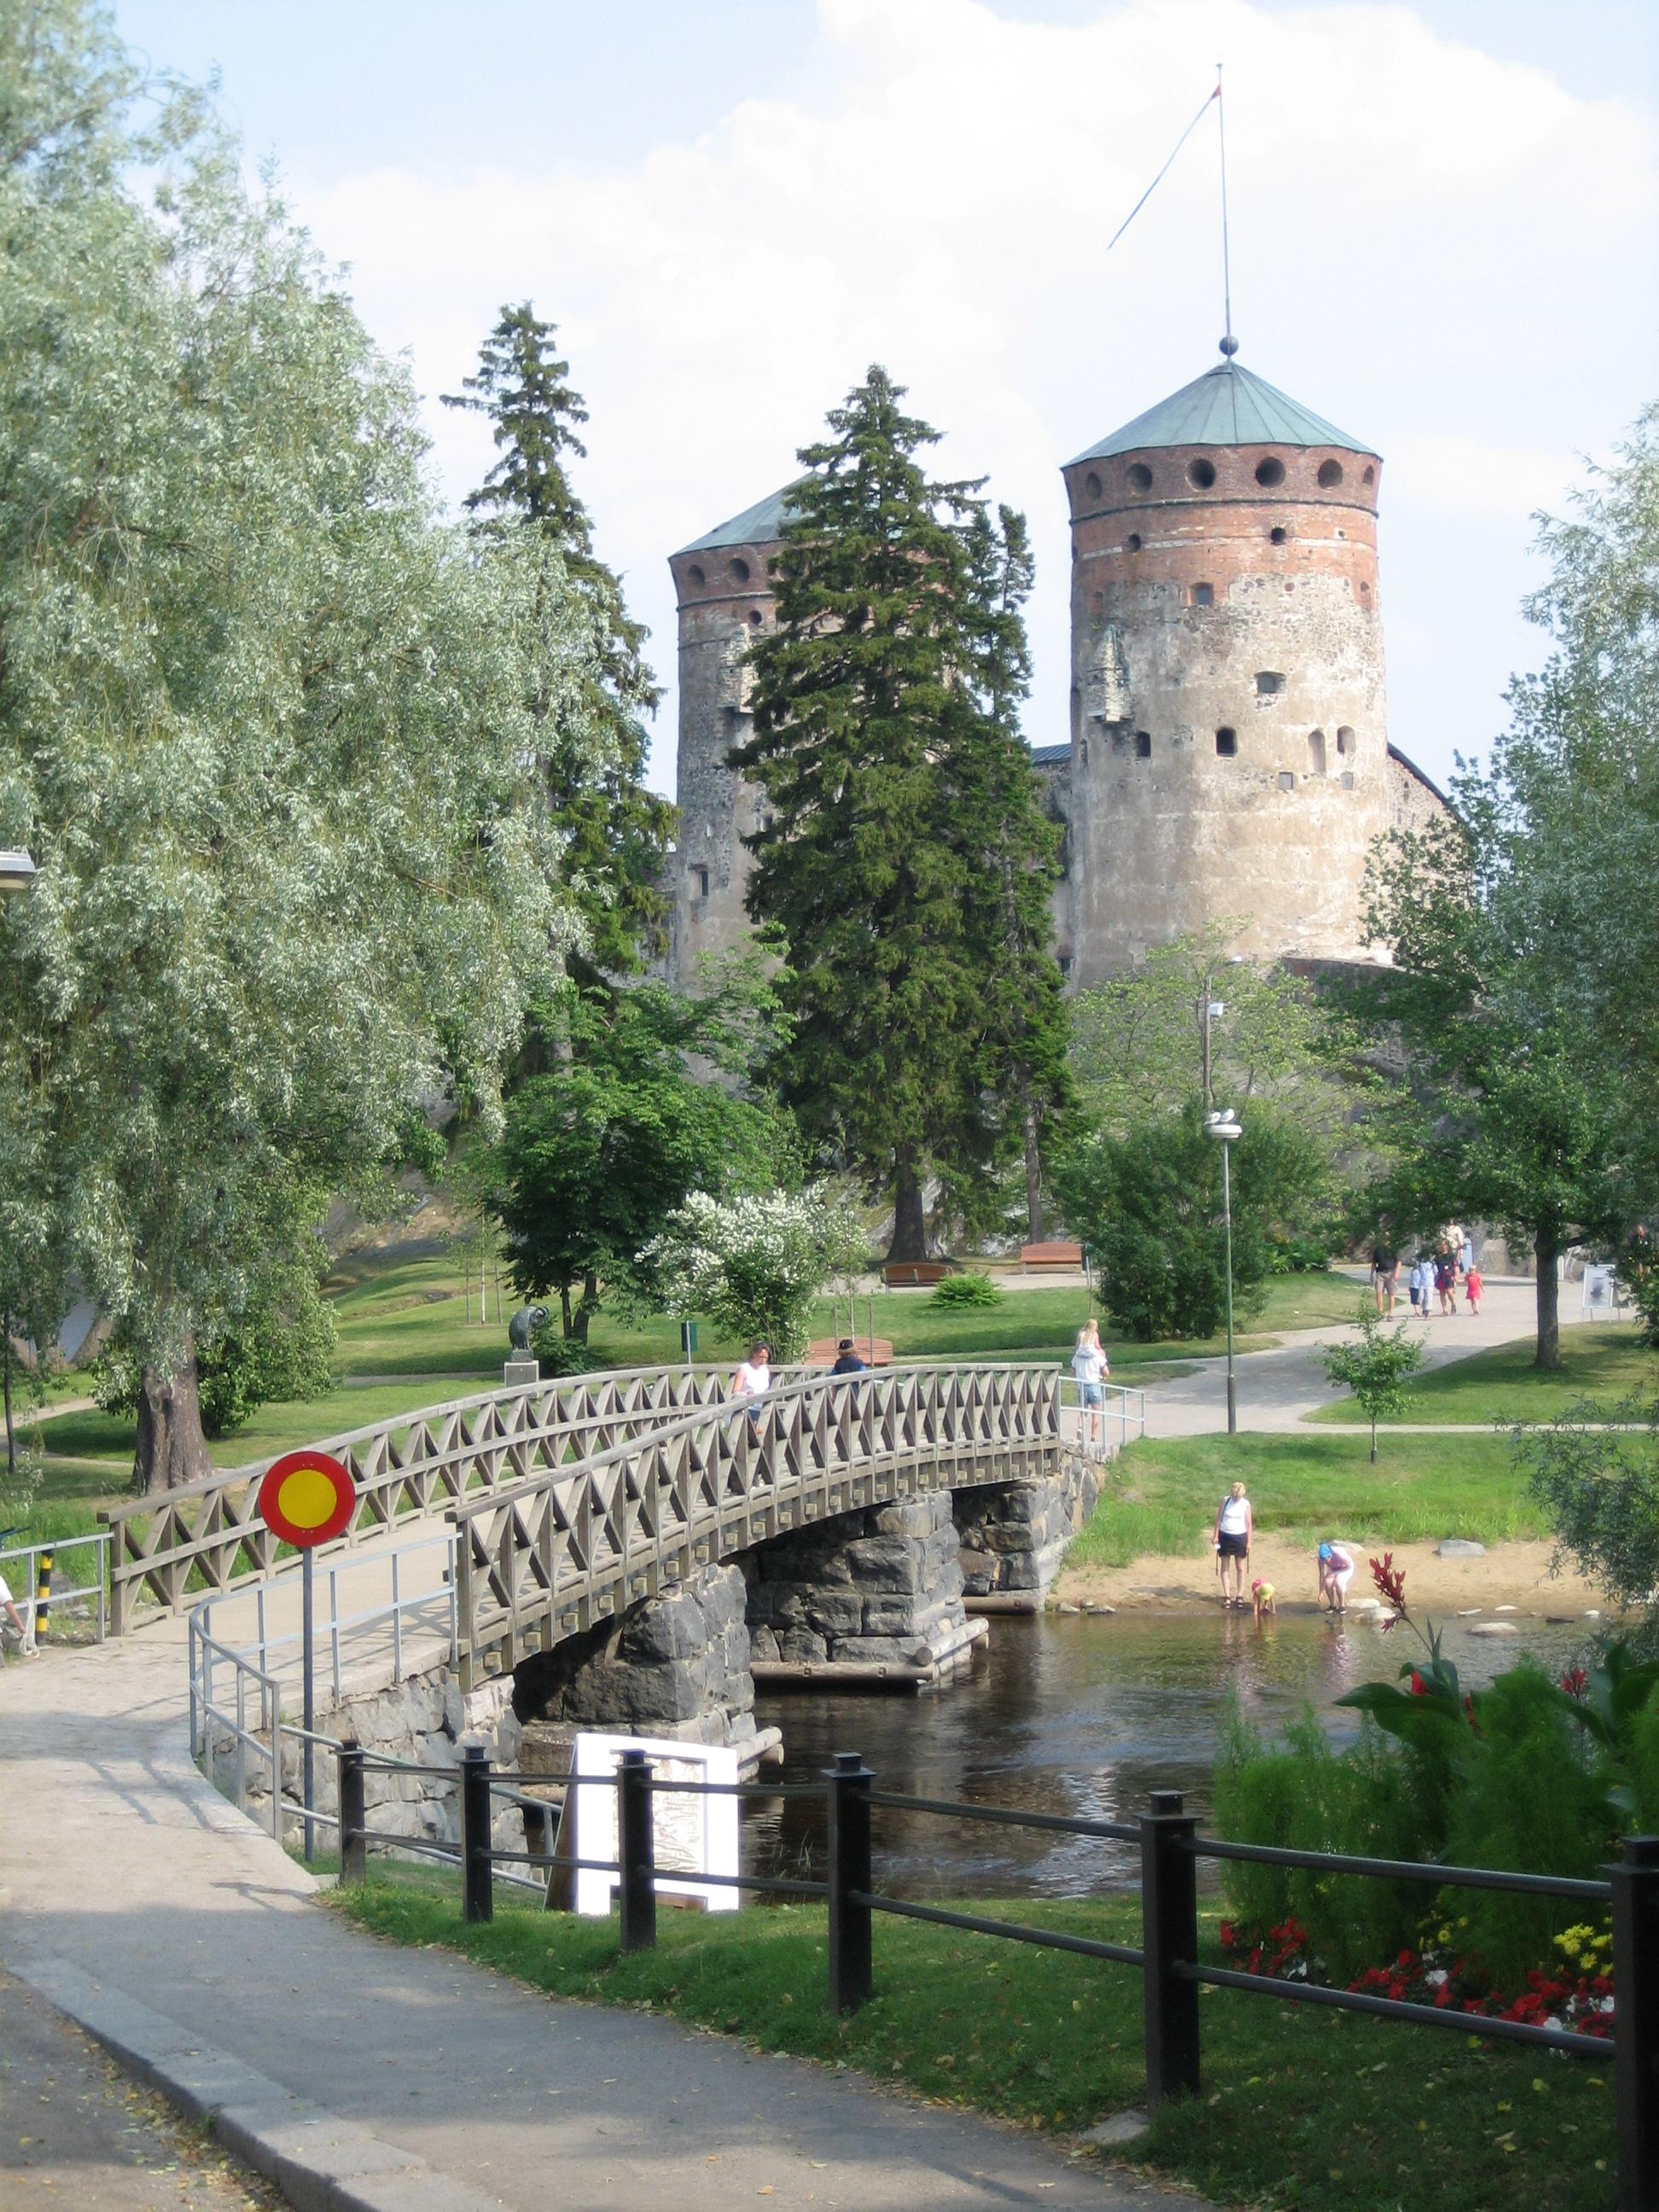 Olavinlinna Castle, Savonlinna: Address, Phone Number, Olavinlinna Castle Reviews: 5/5